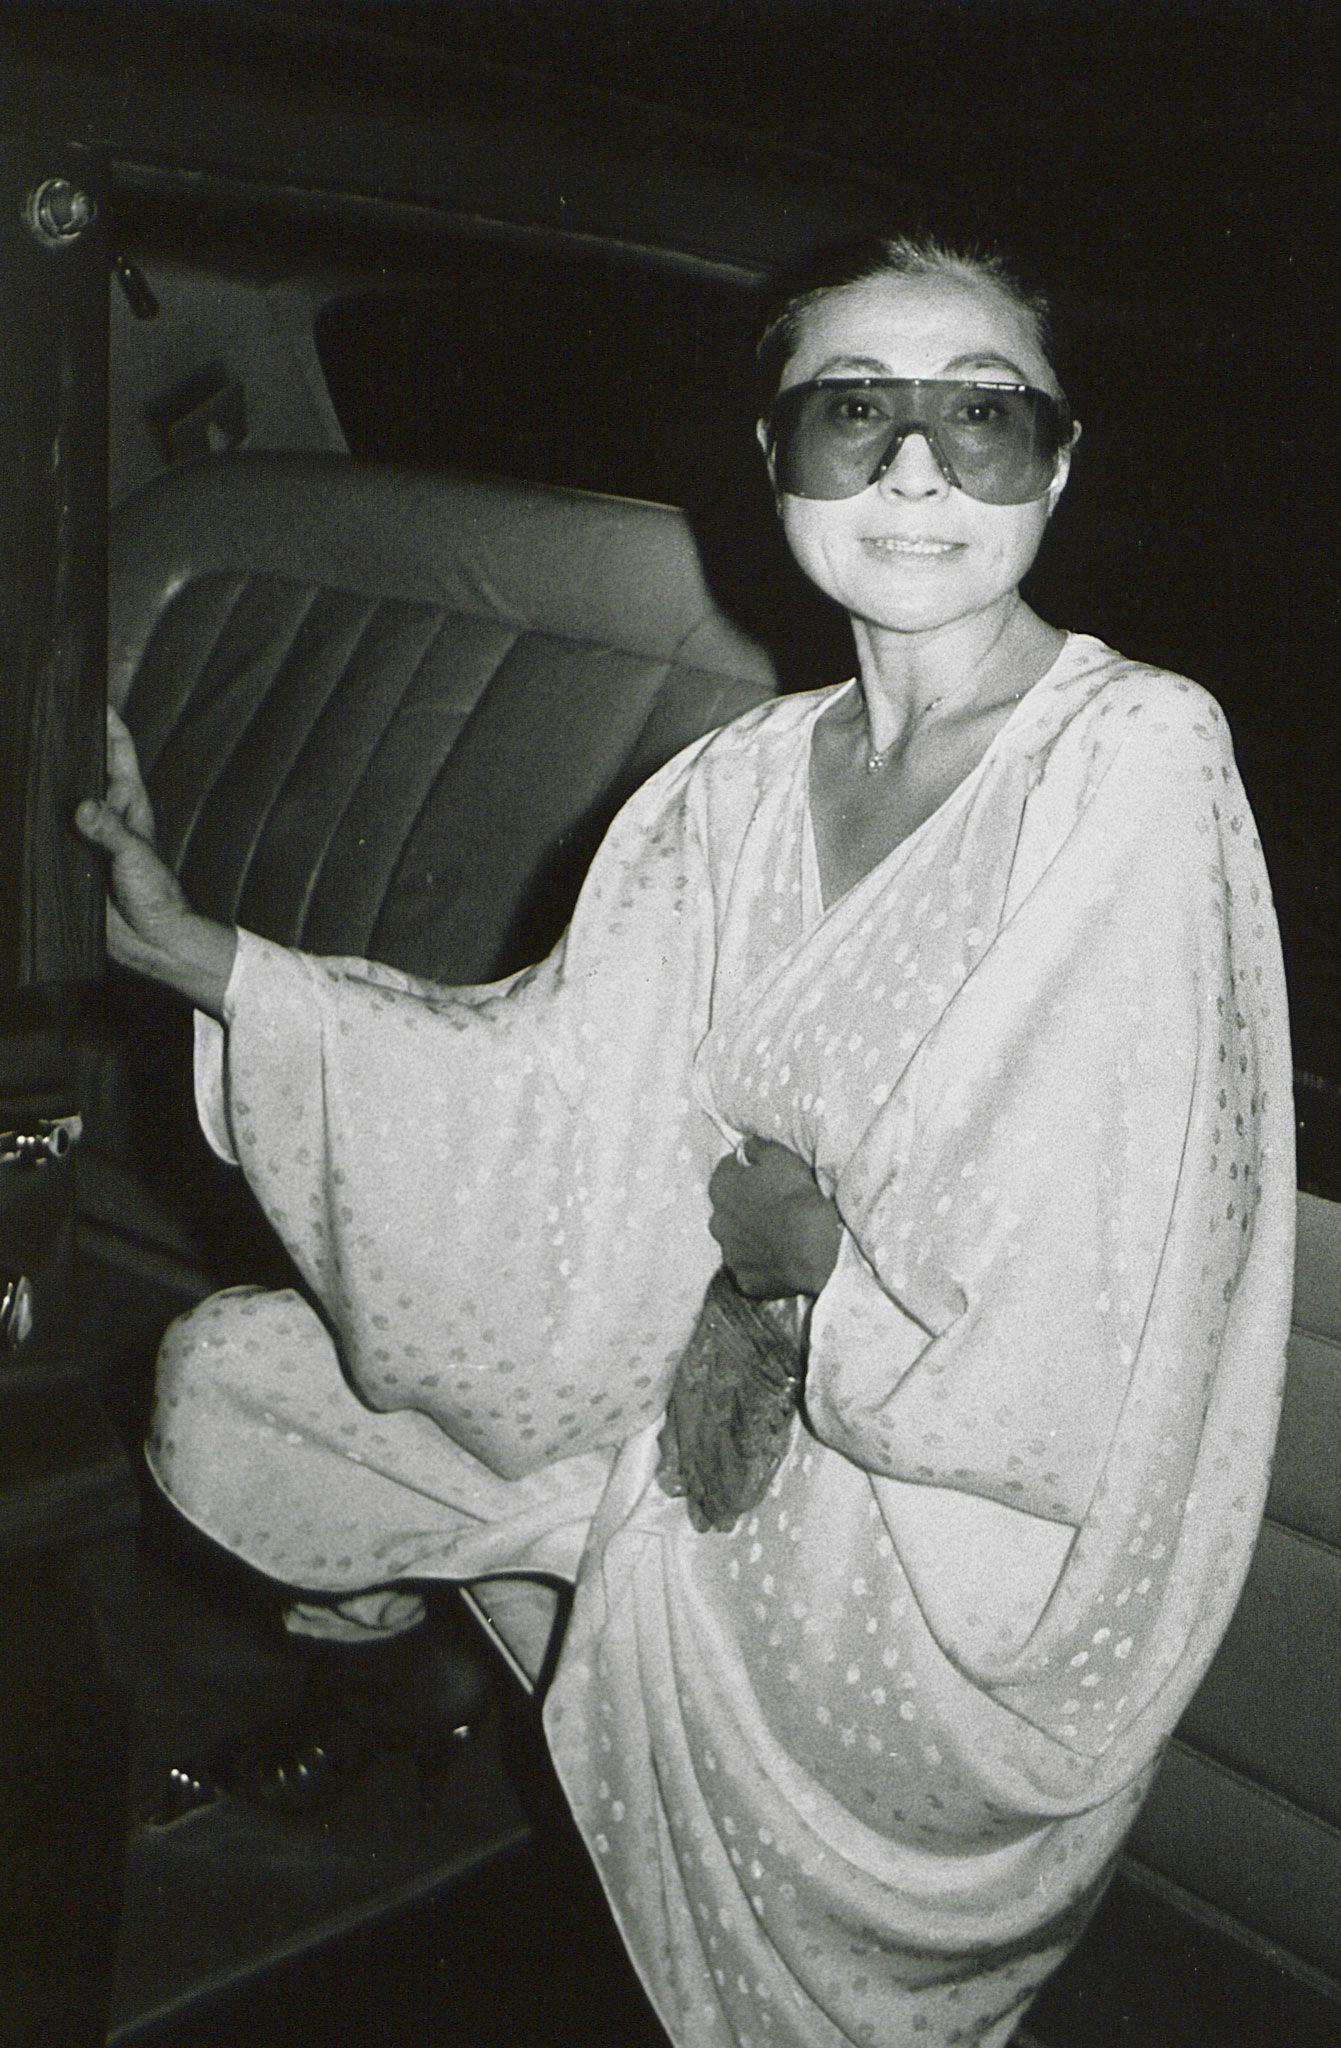 Yoko motorcycle gloves - 11 Great Shots Of Yoko Ono Unlikely Style Icon Gallery Style Com